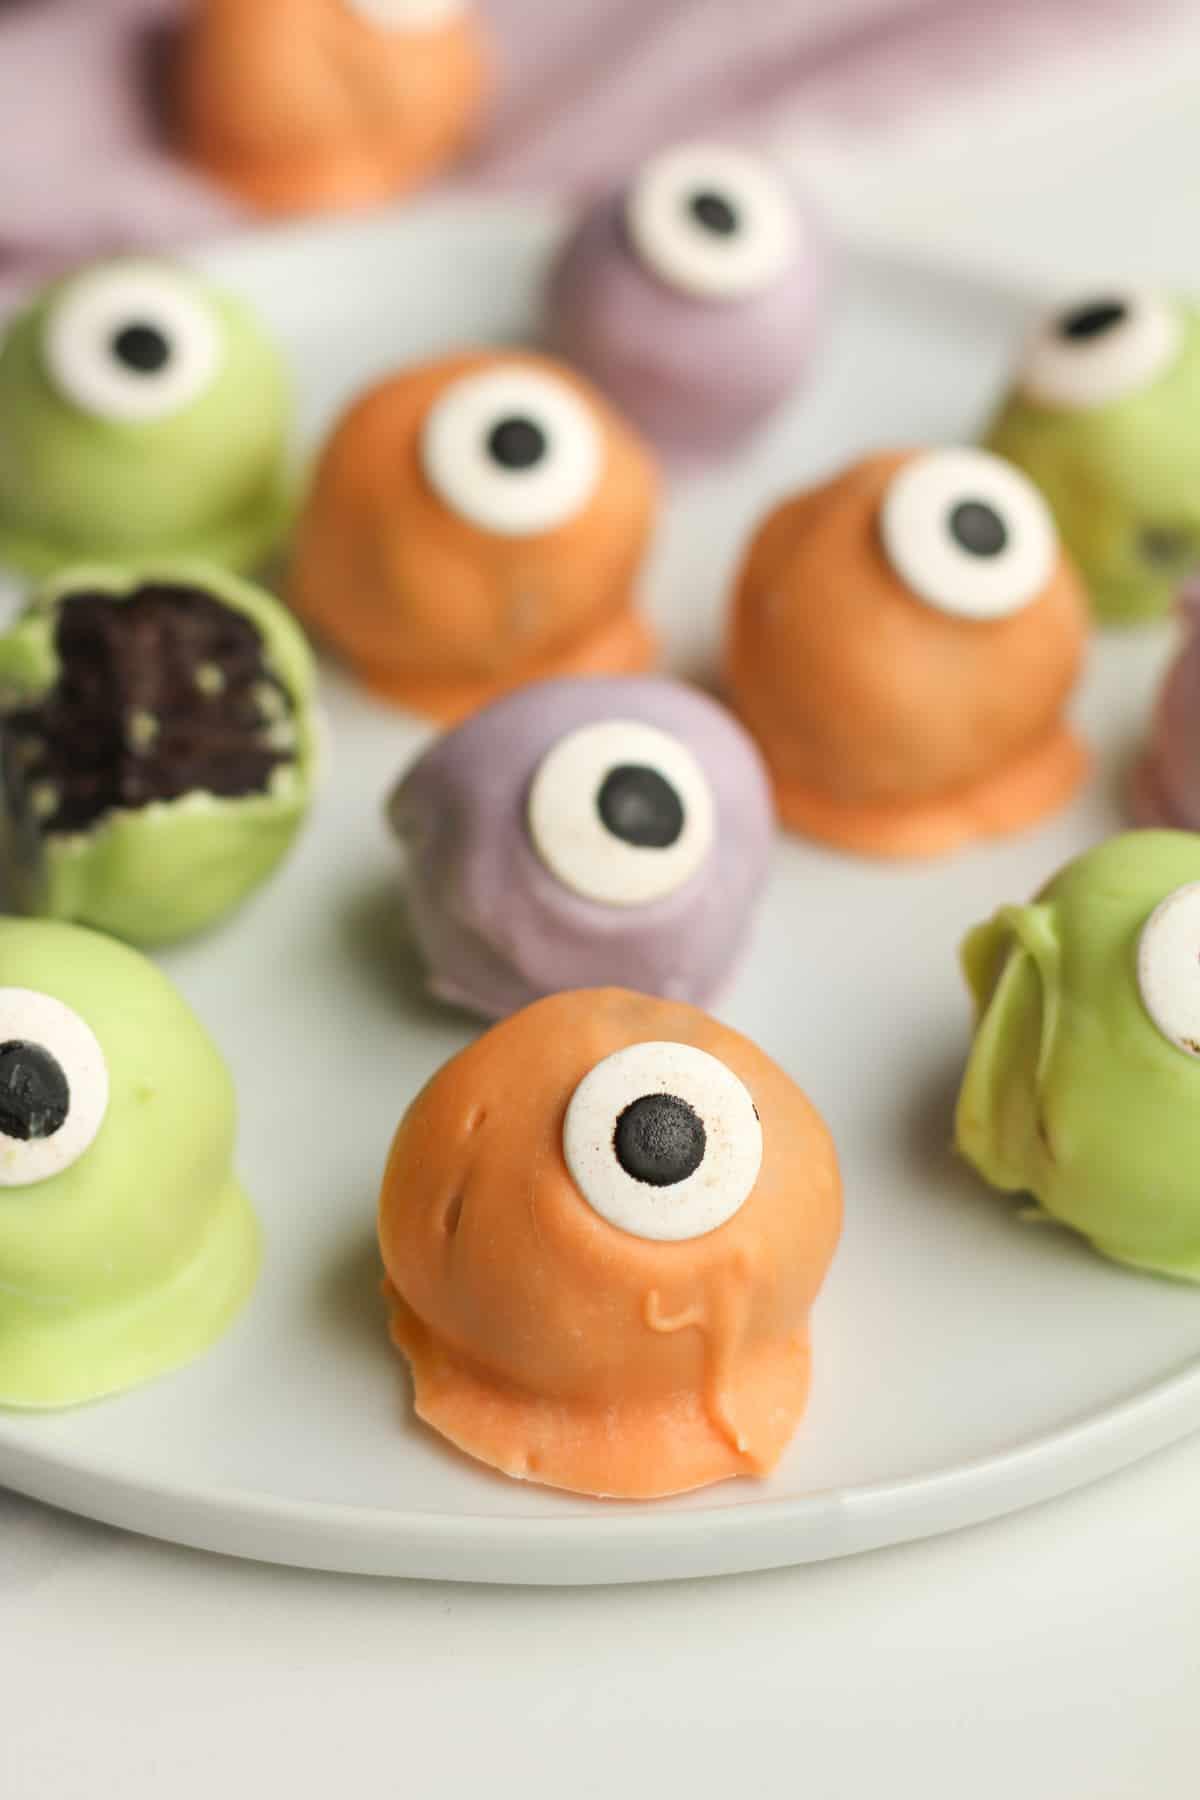 Oreo Cookie Eyeballs